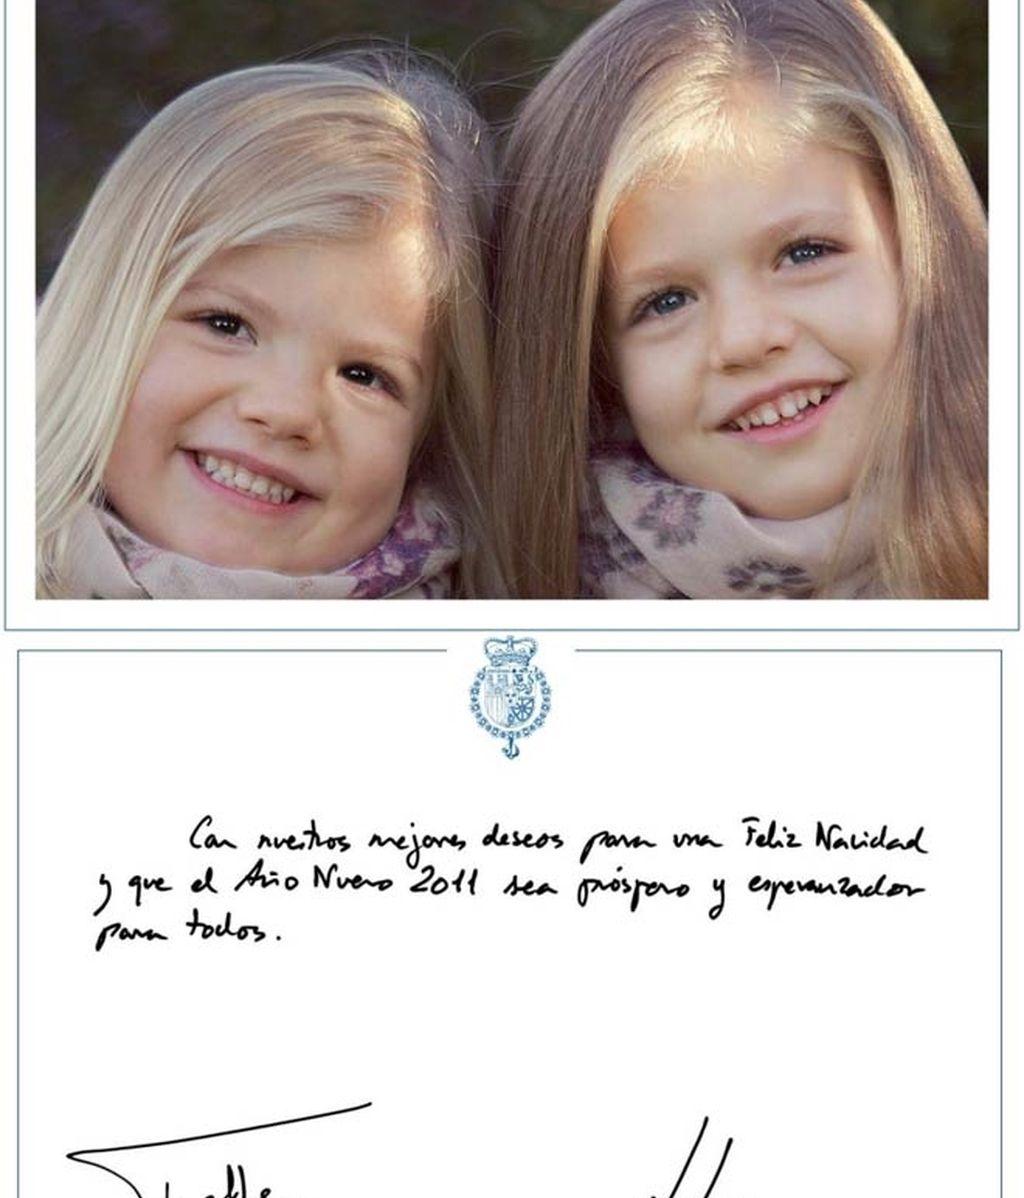 La Familia Real os desea... ¡Feliz Navidad!